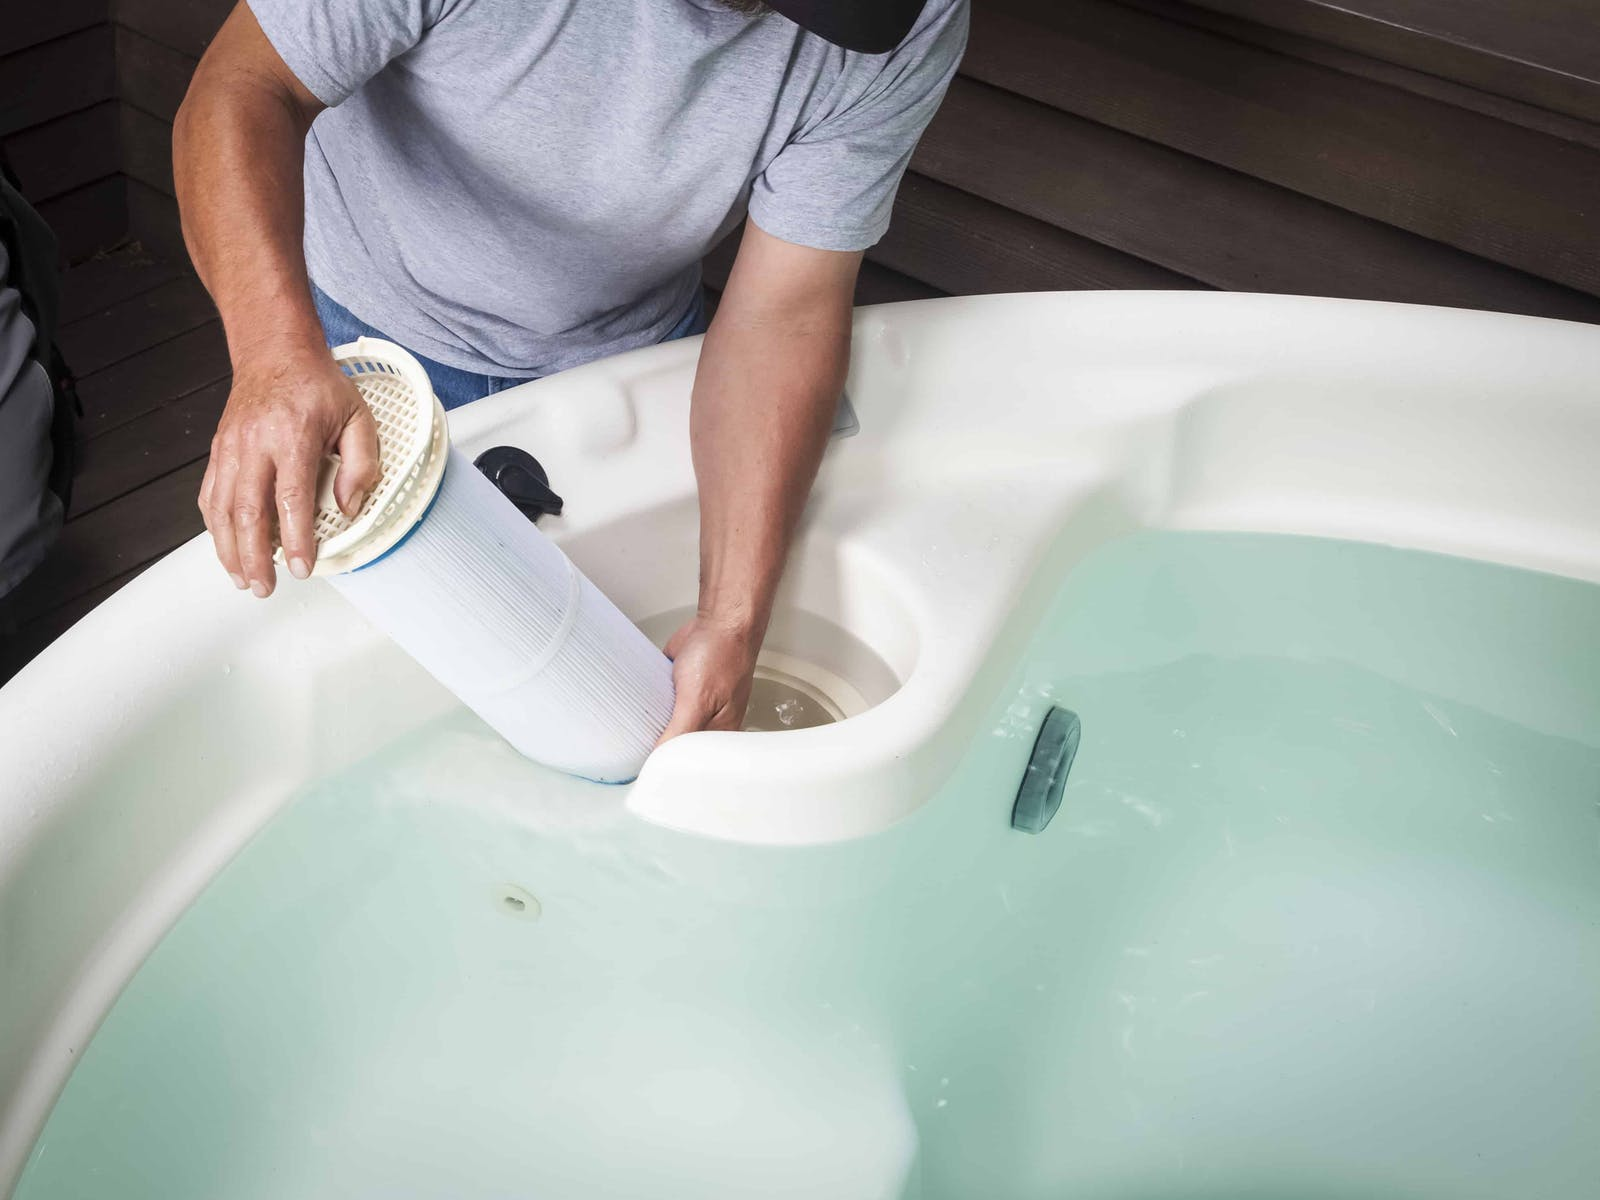 A housekeeper cleaning a hot tub